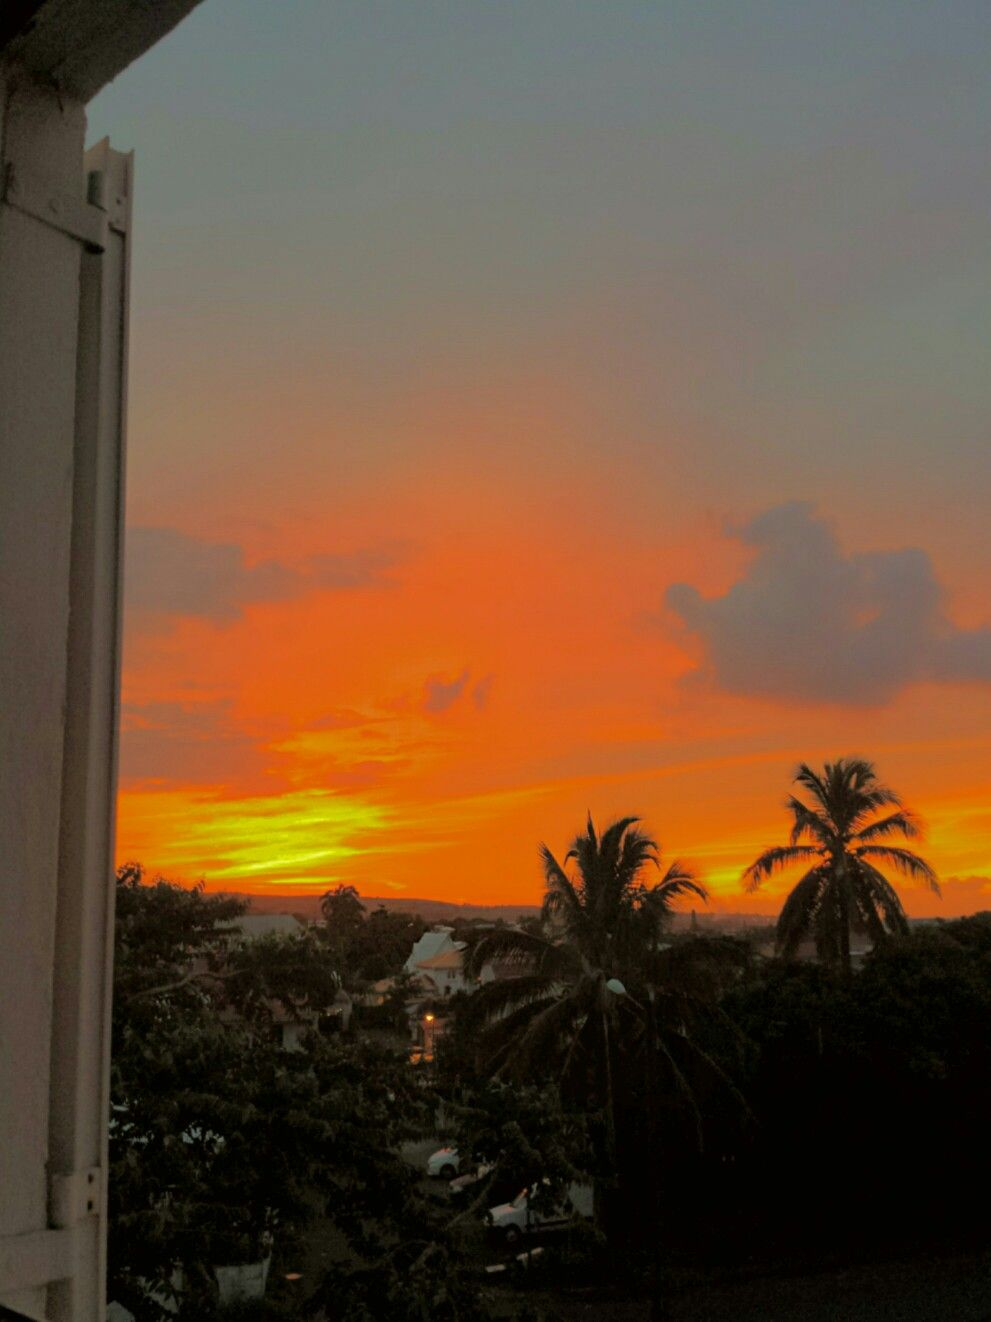 Sunset In Reunion Islande En 2020 Coucher De Soleil Fond D Ecran Telephone La Reunion